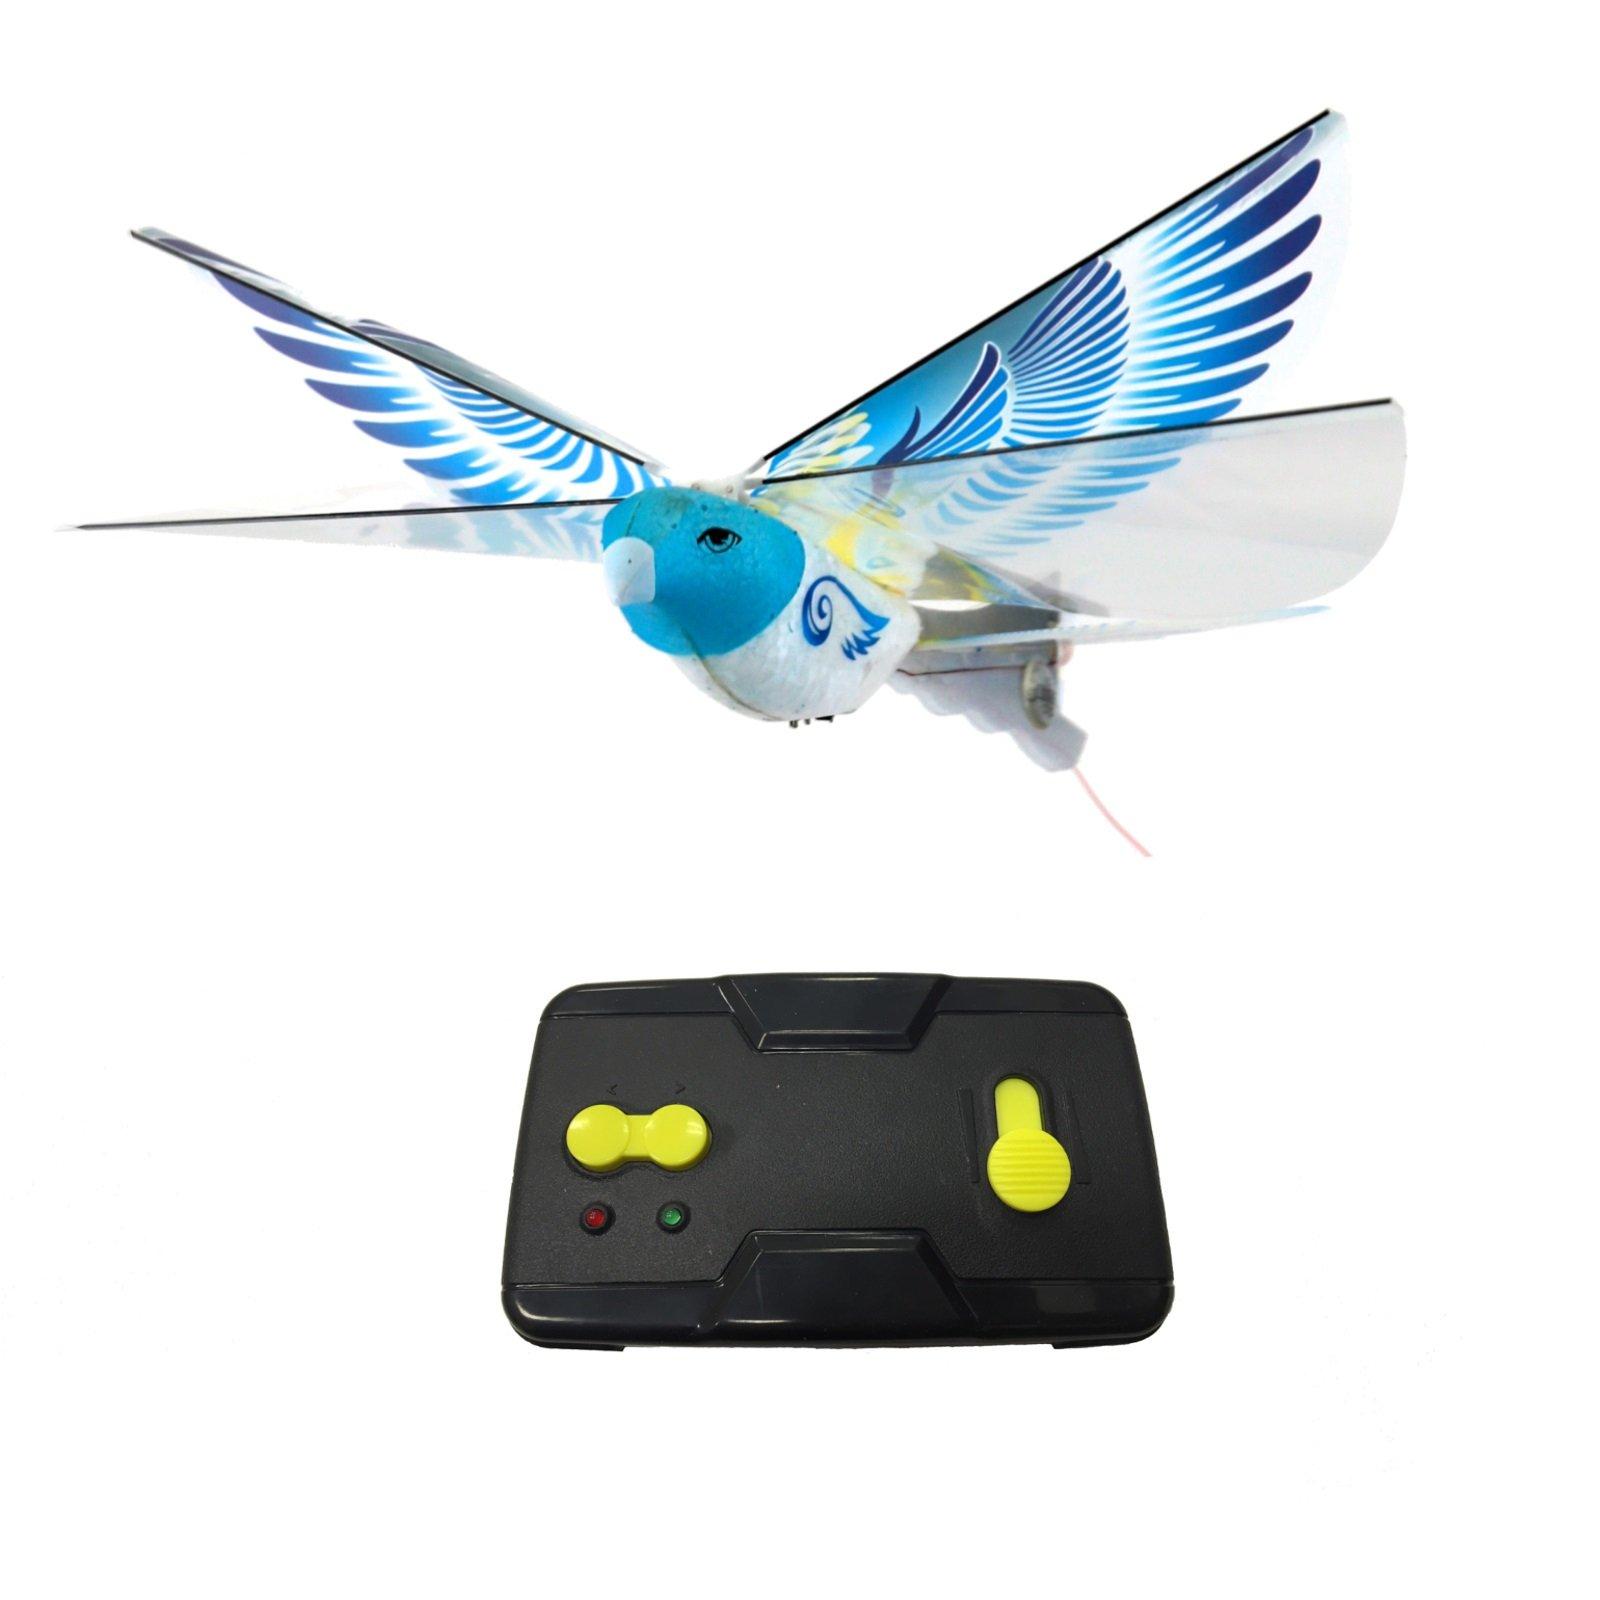 MukikiM eBird Blue Pigeon - 2016 Creative Child Preferred Choice Award Winning Flying RC Toy - Remote Control Bionic Bird (Newest 2.4GHz Version Featuring USB Charging)